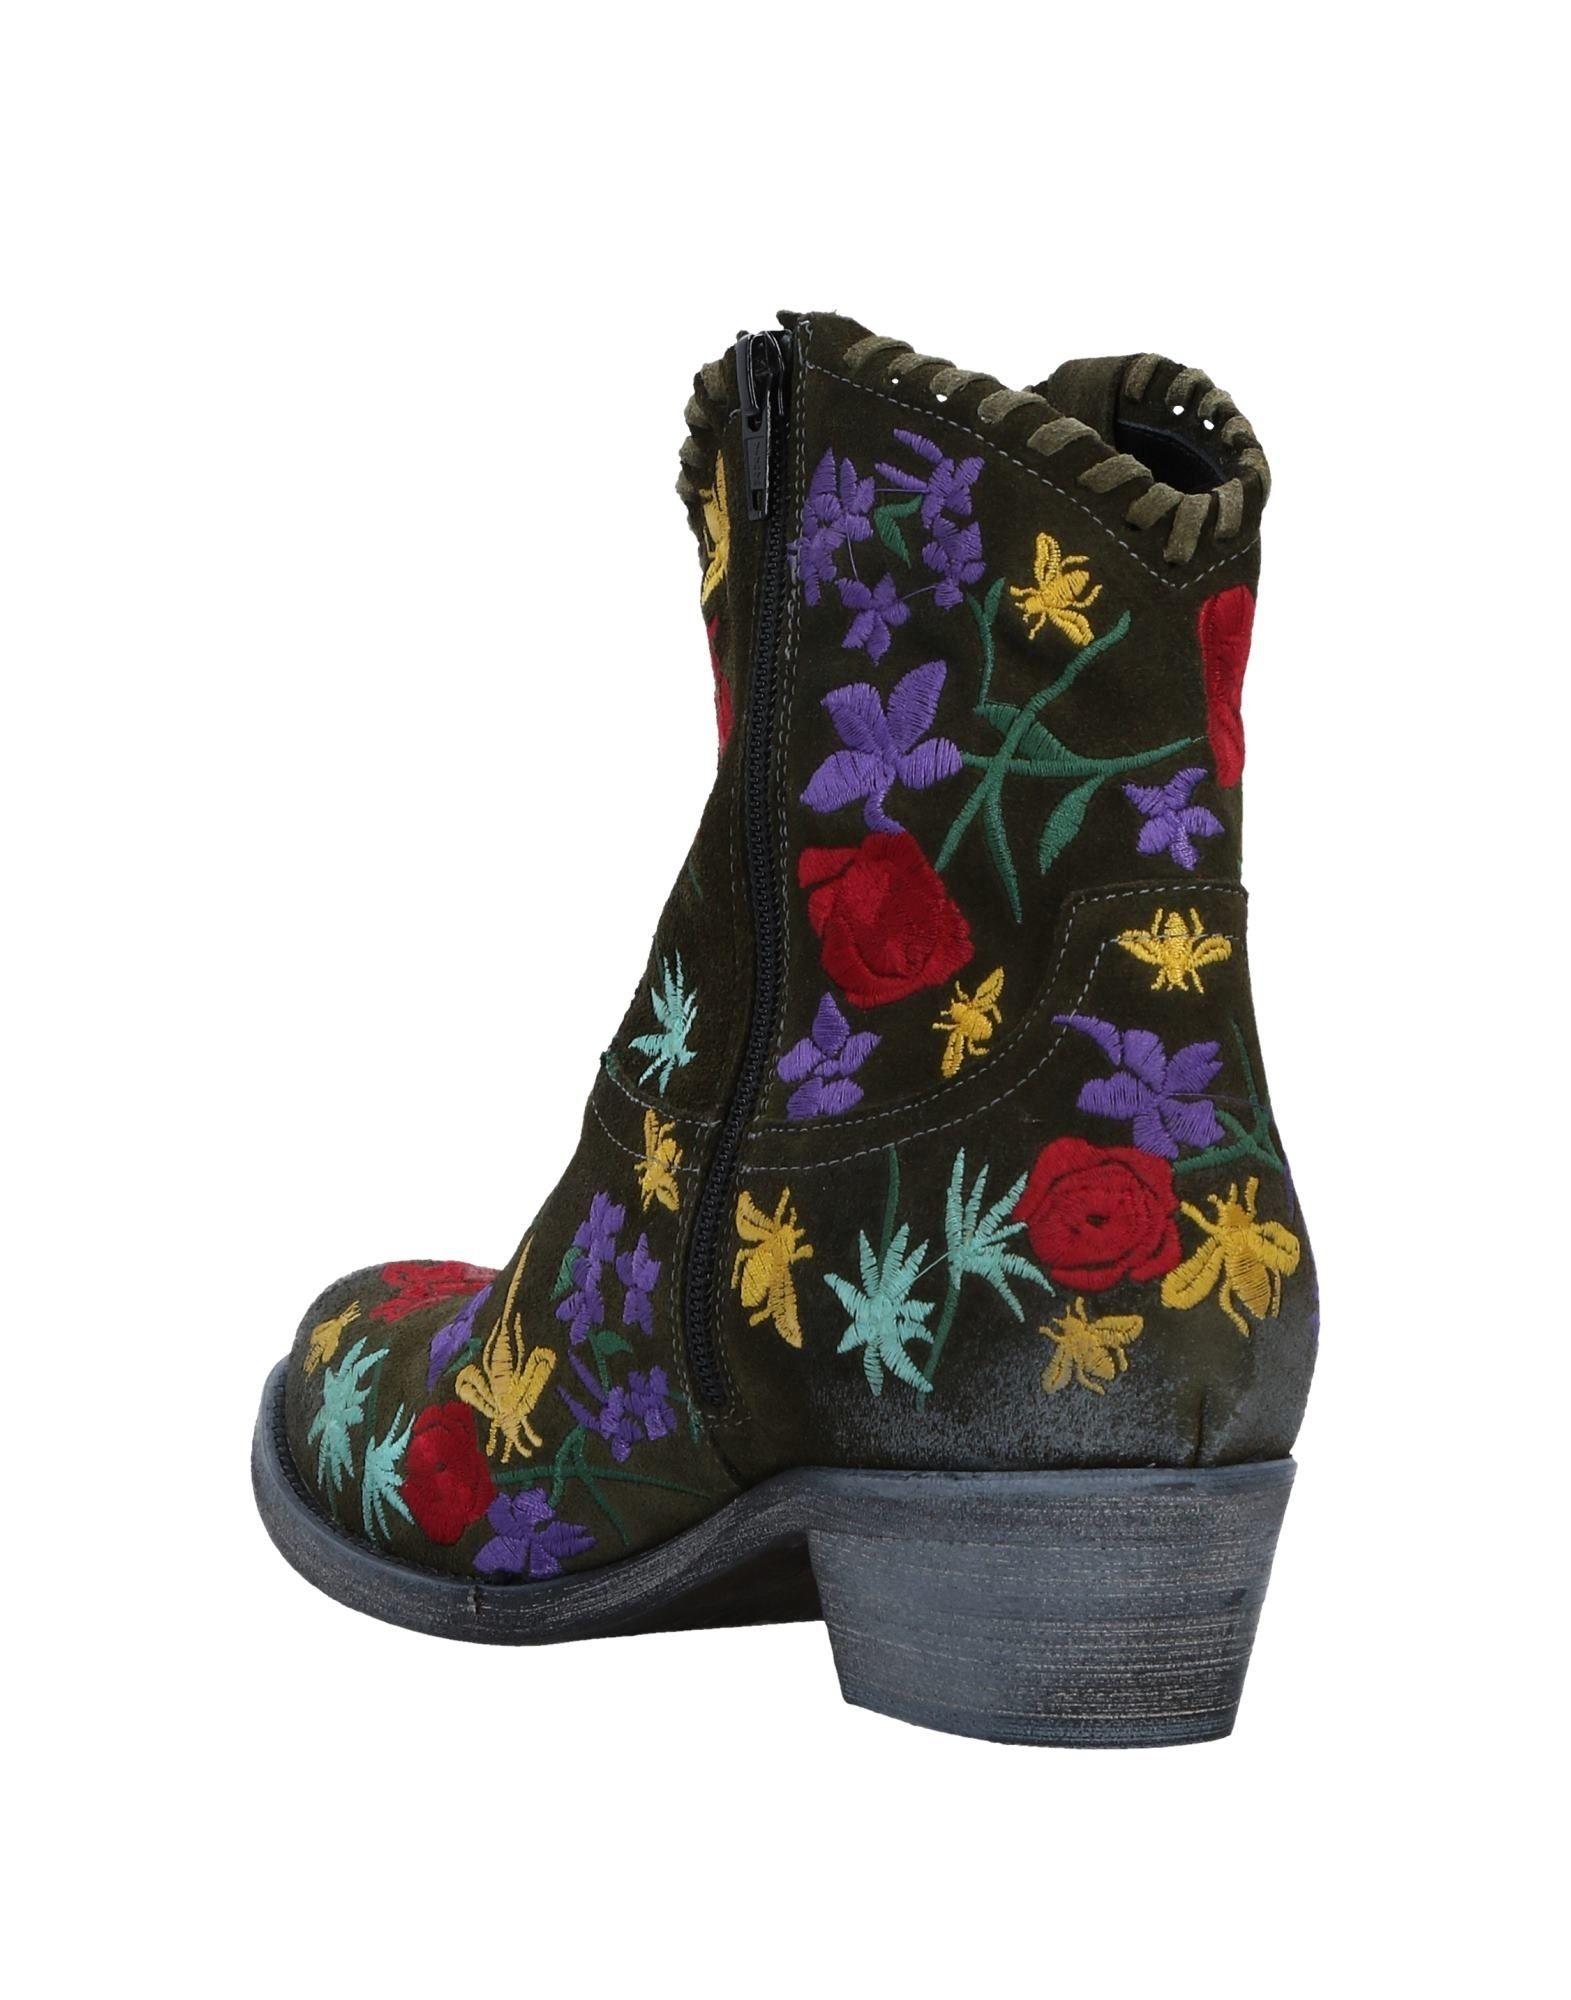 Gut um billige Schuhe Damen zu tragenFrancesco Minichino Stiefelette Damen Schuhe  11533993PK 0eccaf